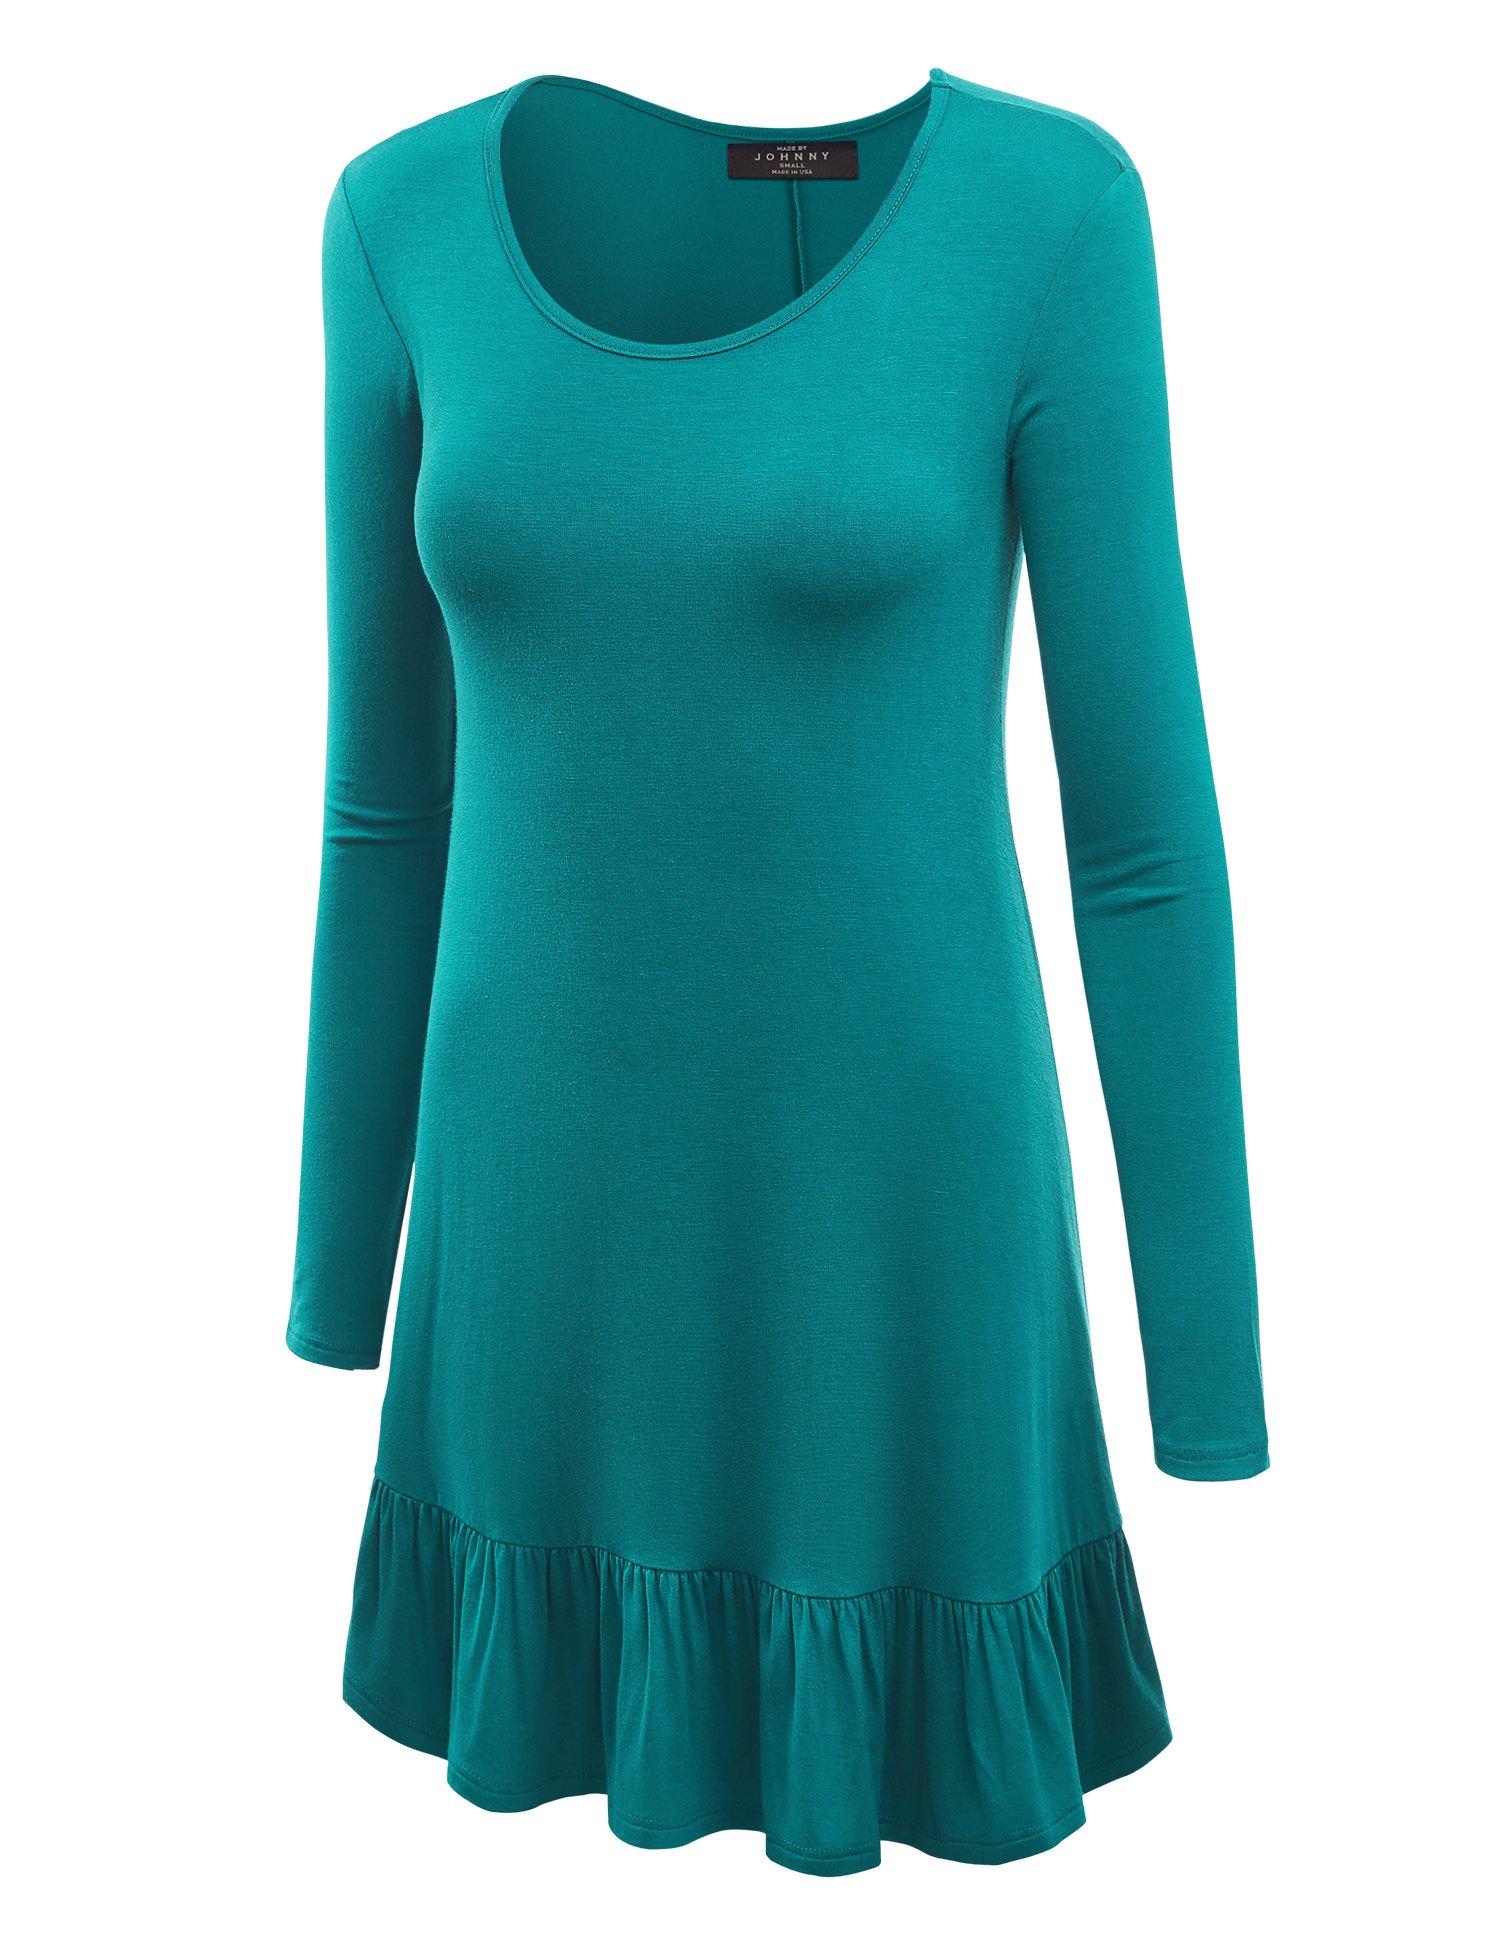 Available at Amazon: MBJ Women's Long Sleeve Bottom Ruffled Tunic Short Dress - Made in USA